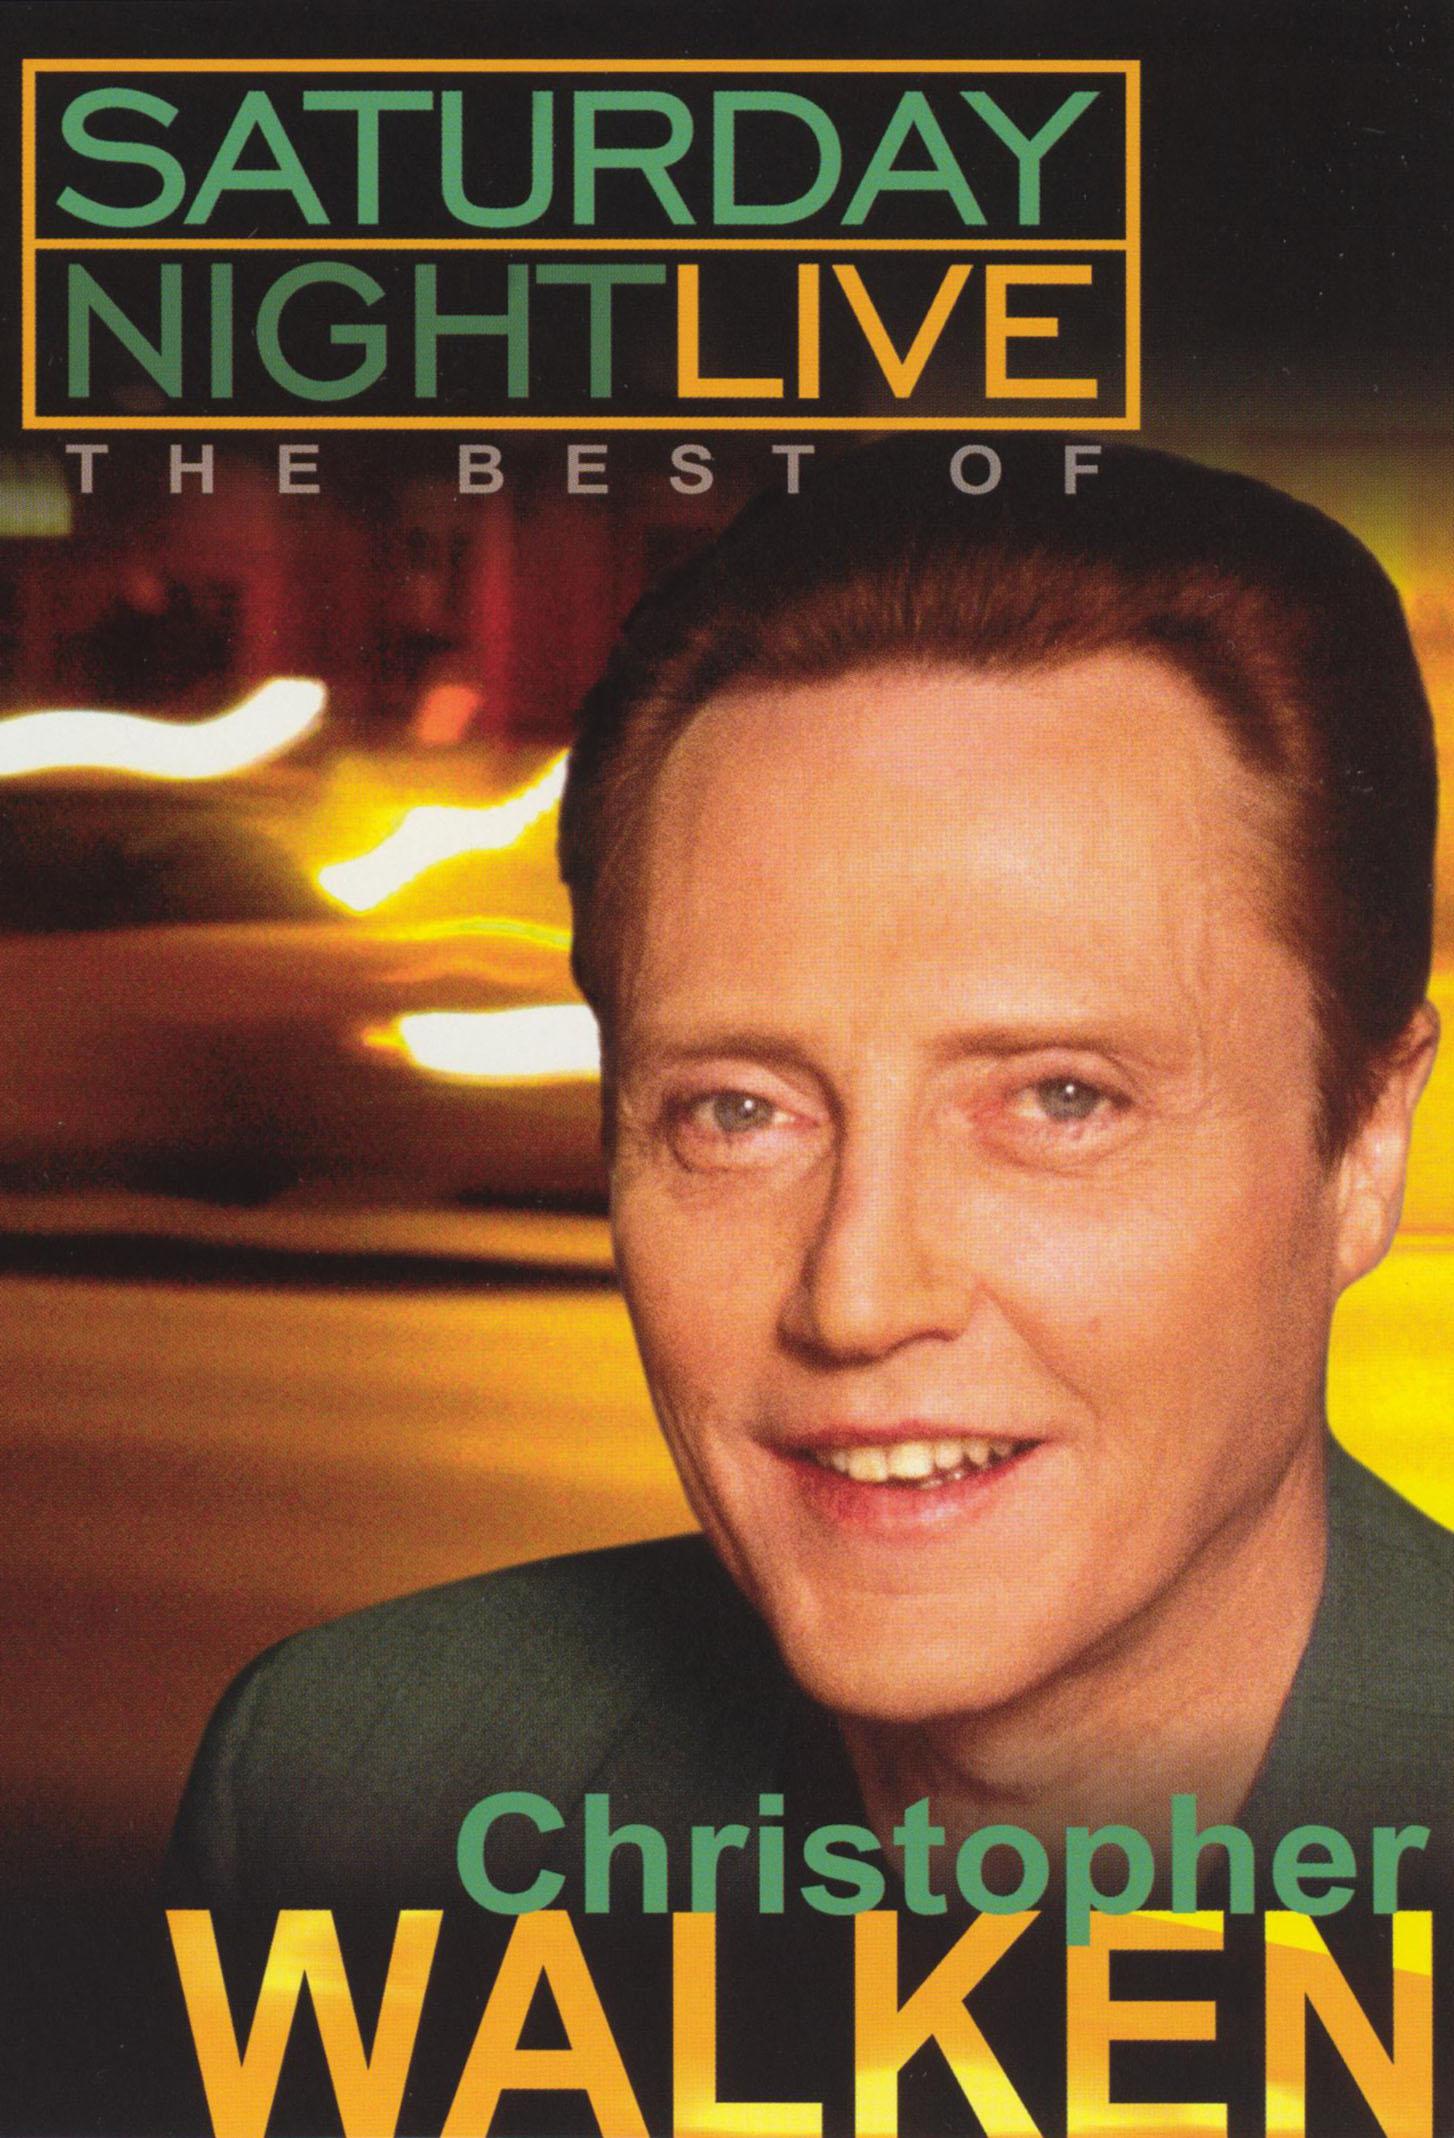 Saturday Night Live: The Best of Christopher Walken